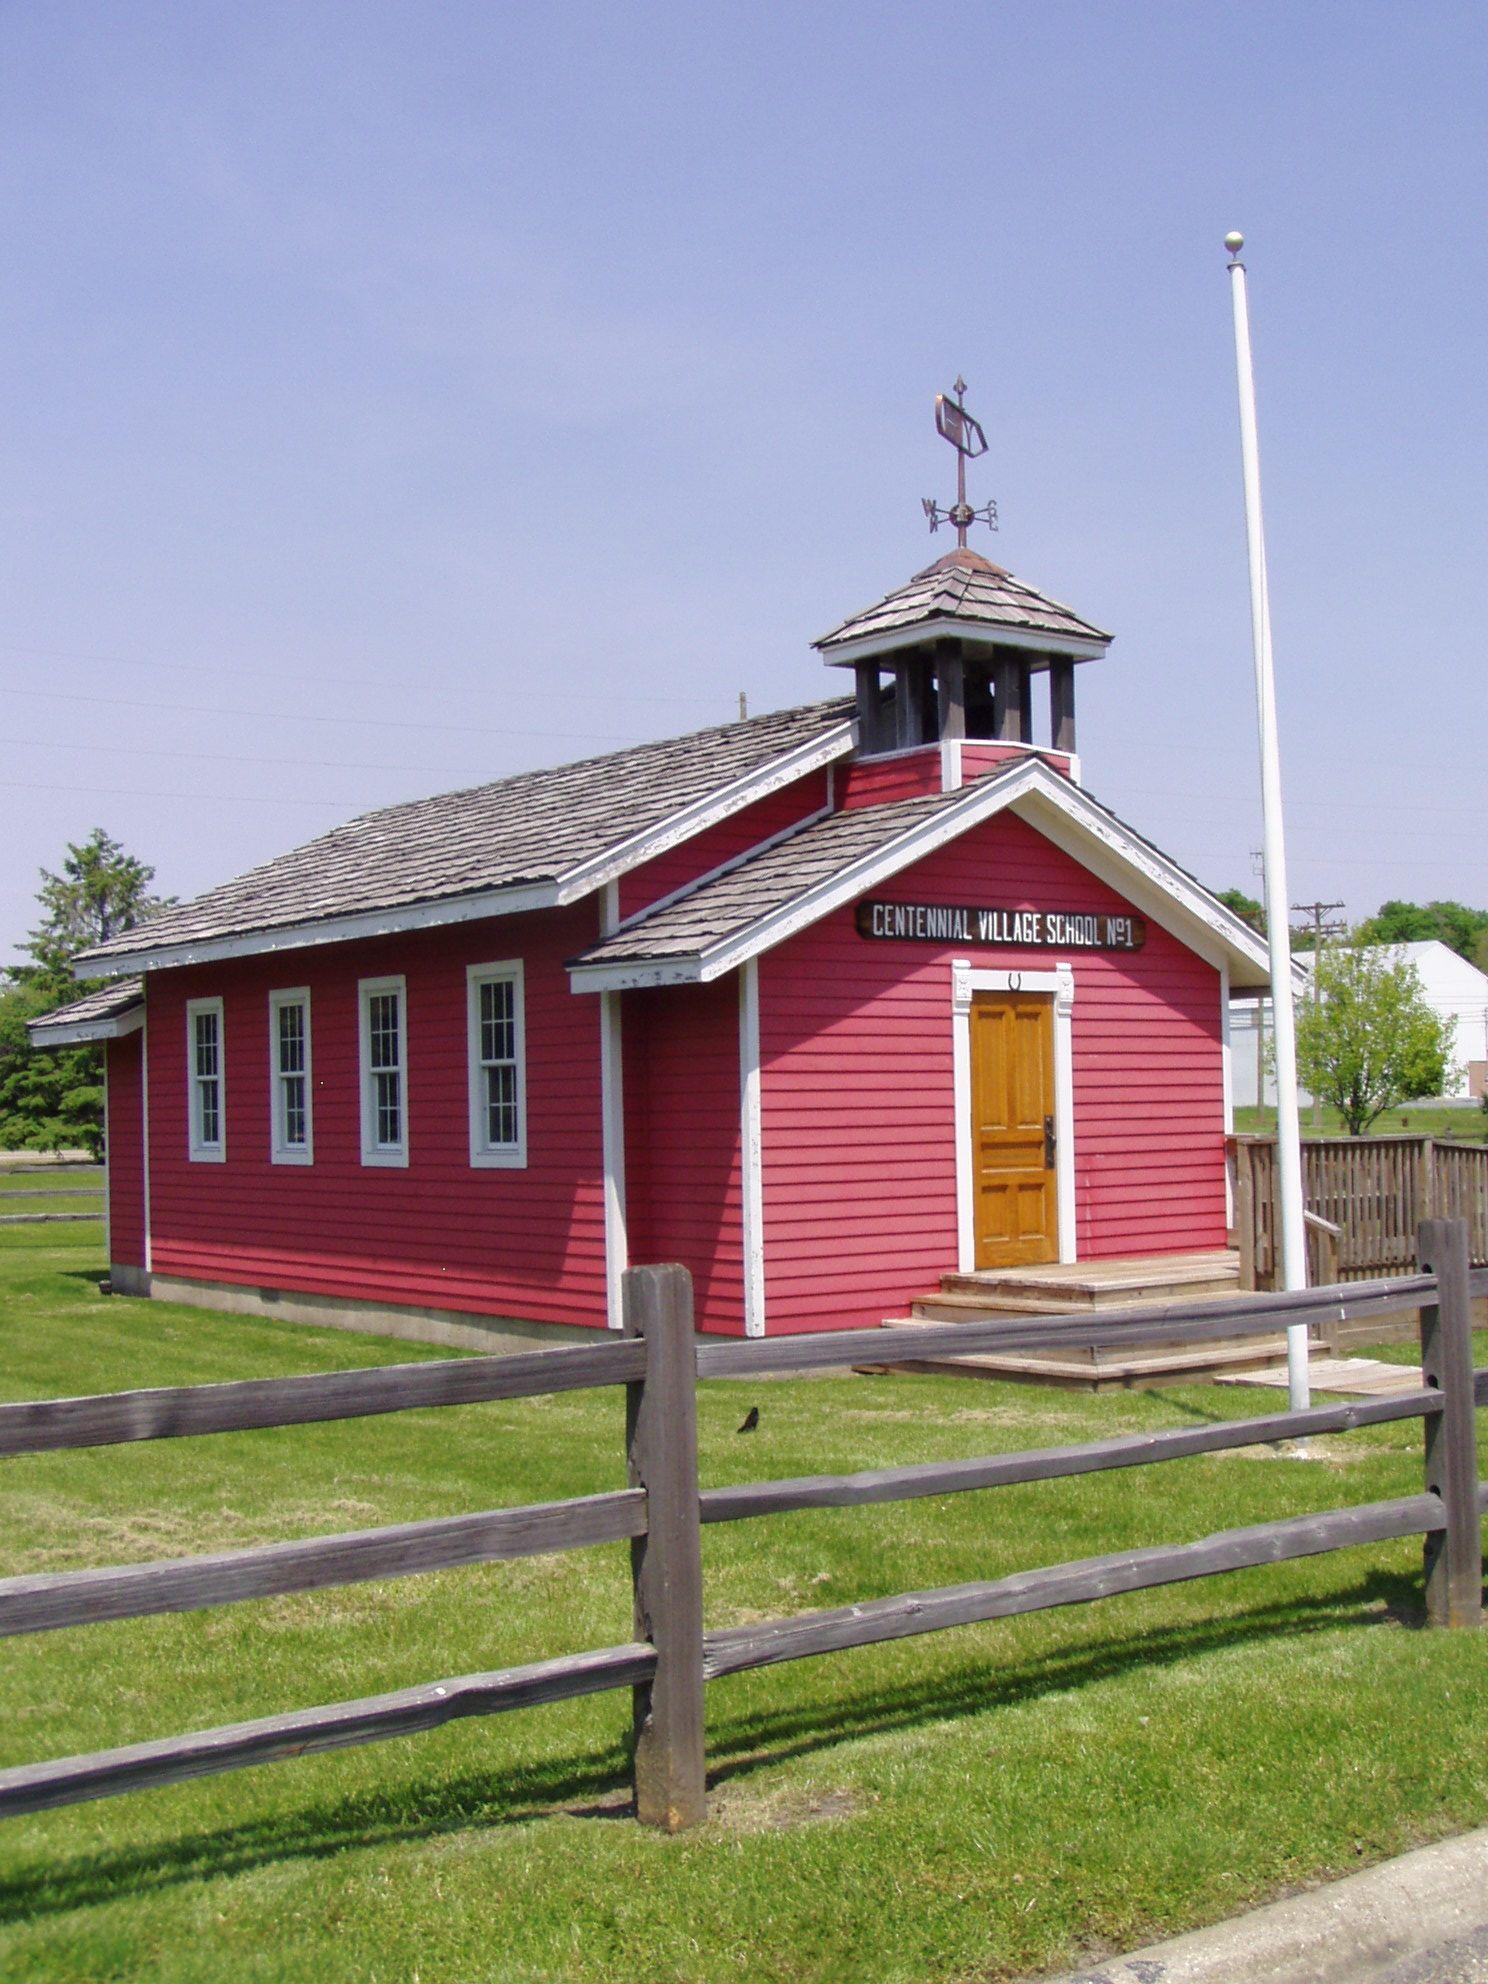 The Little Red Schoolhouse Centennial Park